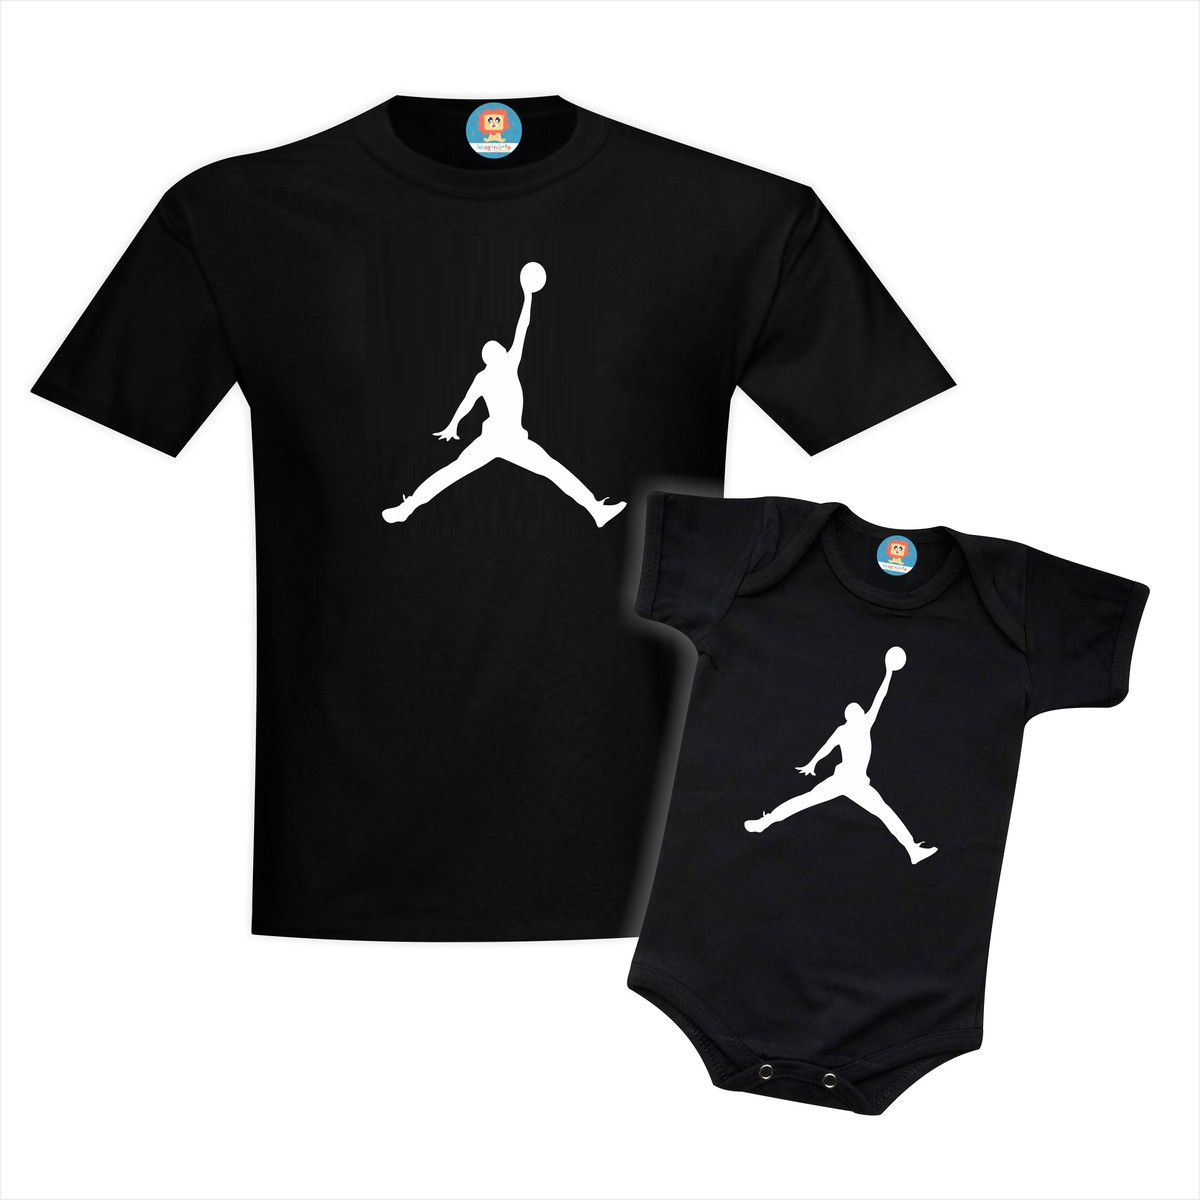 Kit Camiseta e Roupinha de Bebê Jordan Basquete NBA Basket Ball Dia dos Pais